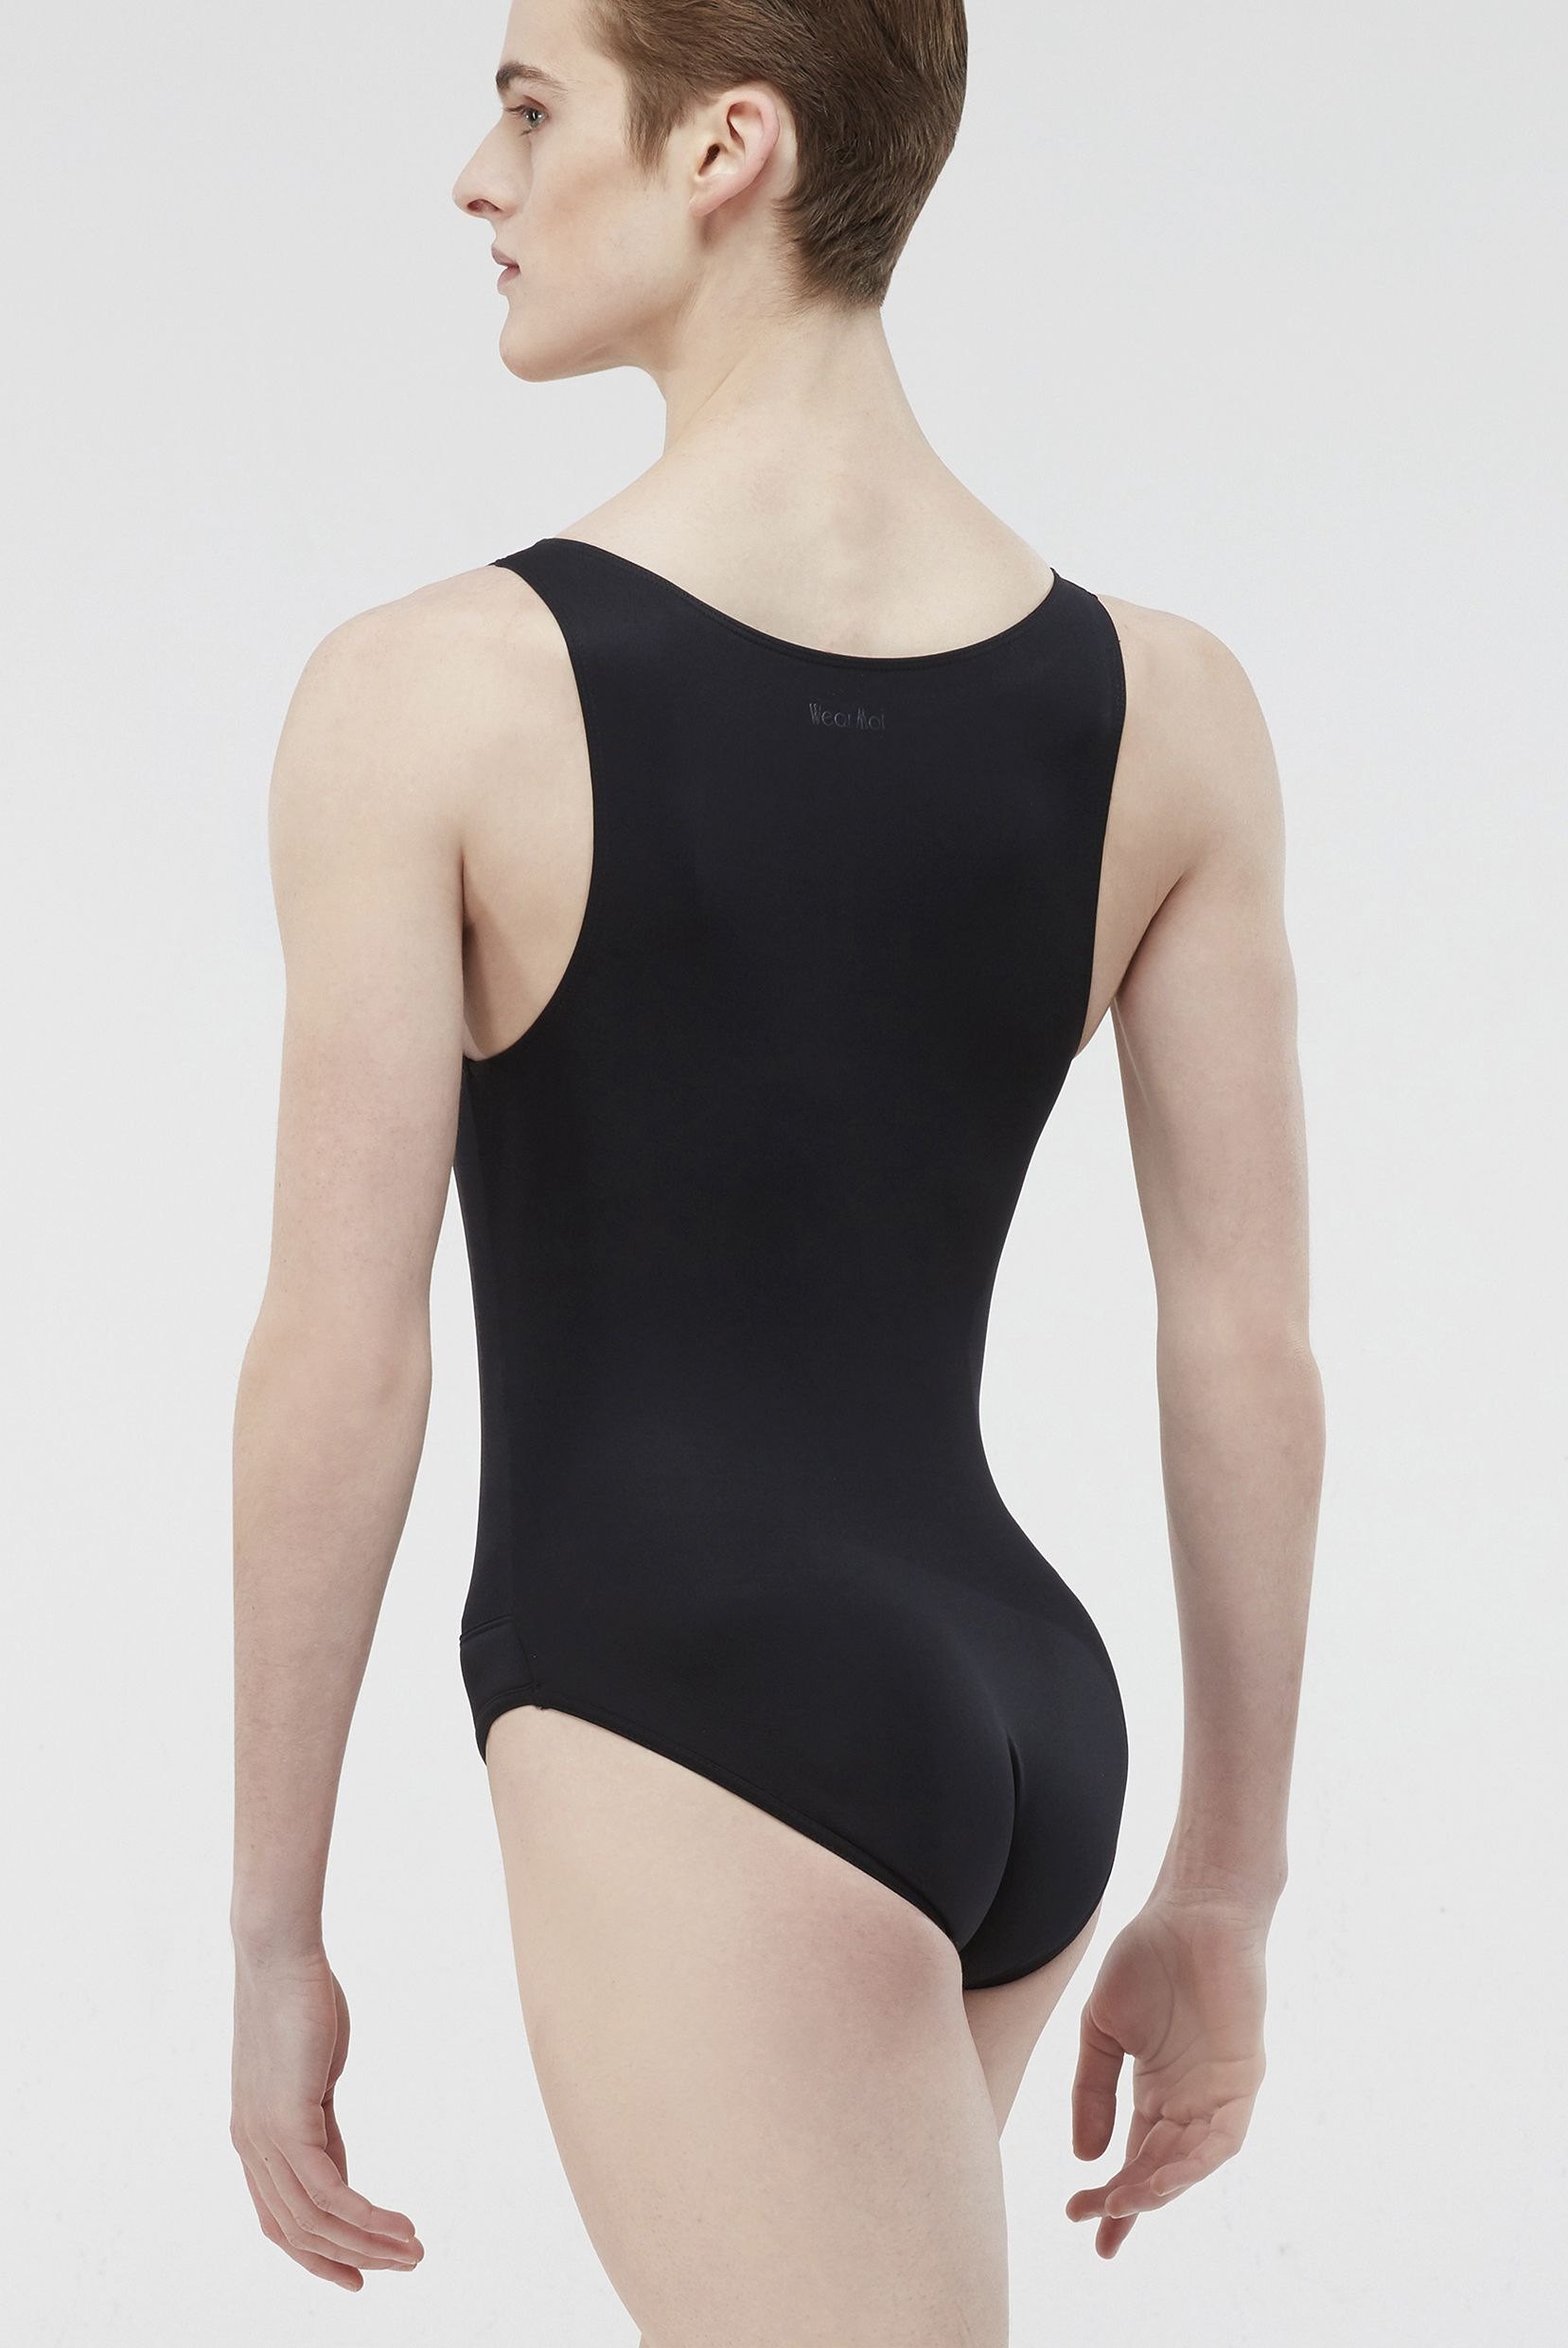 Octave Microfiber Basic Men S Full Tank Leotard With Attached Full Seat Dance Belt Wearmoi Ballet Ballet Men Male Ballerina Dance Attire Boys Leotard